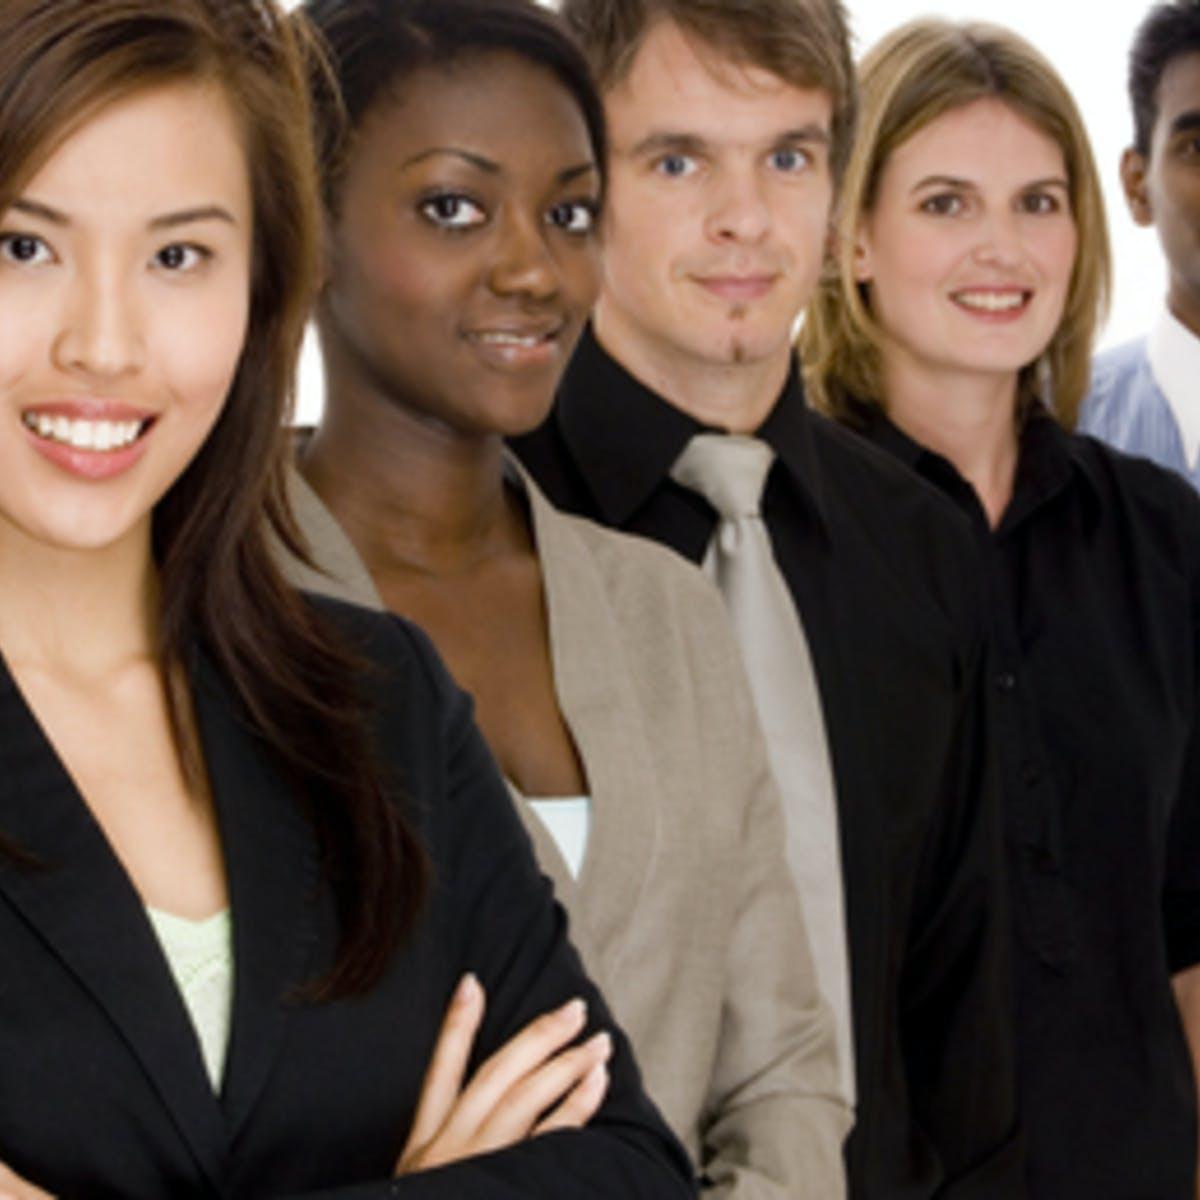 Women in Leadership: Inspiring Positive Change